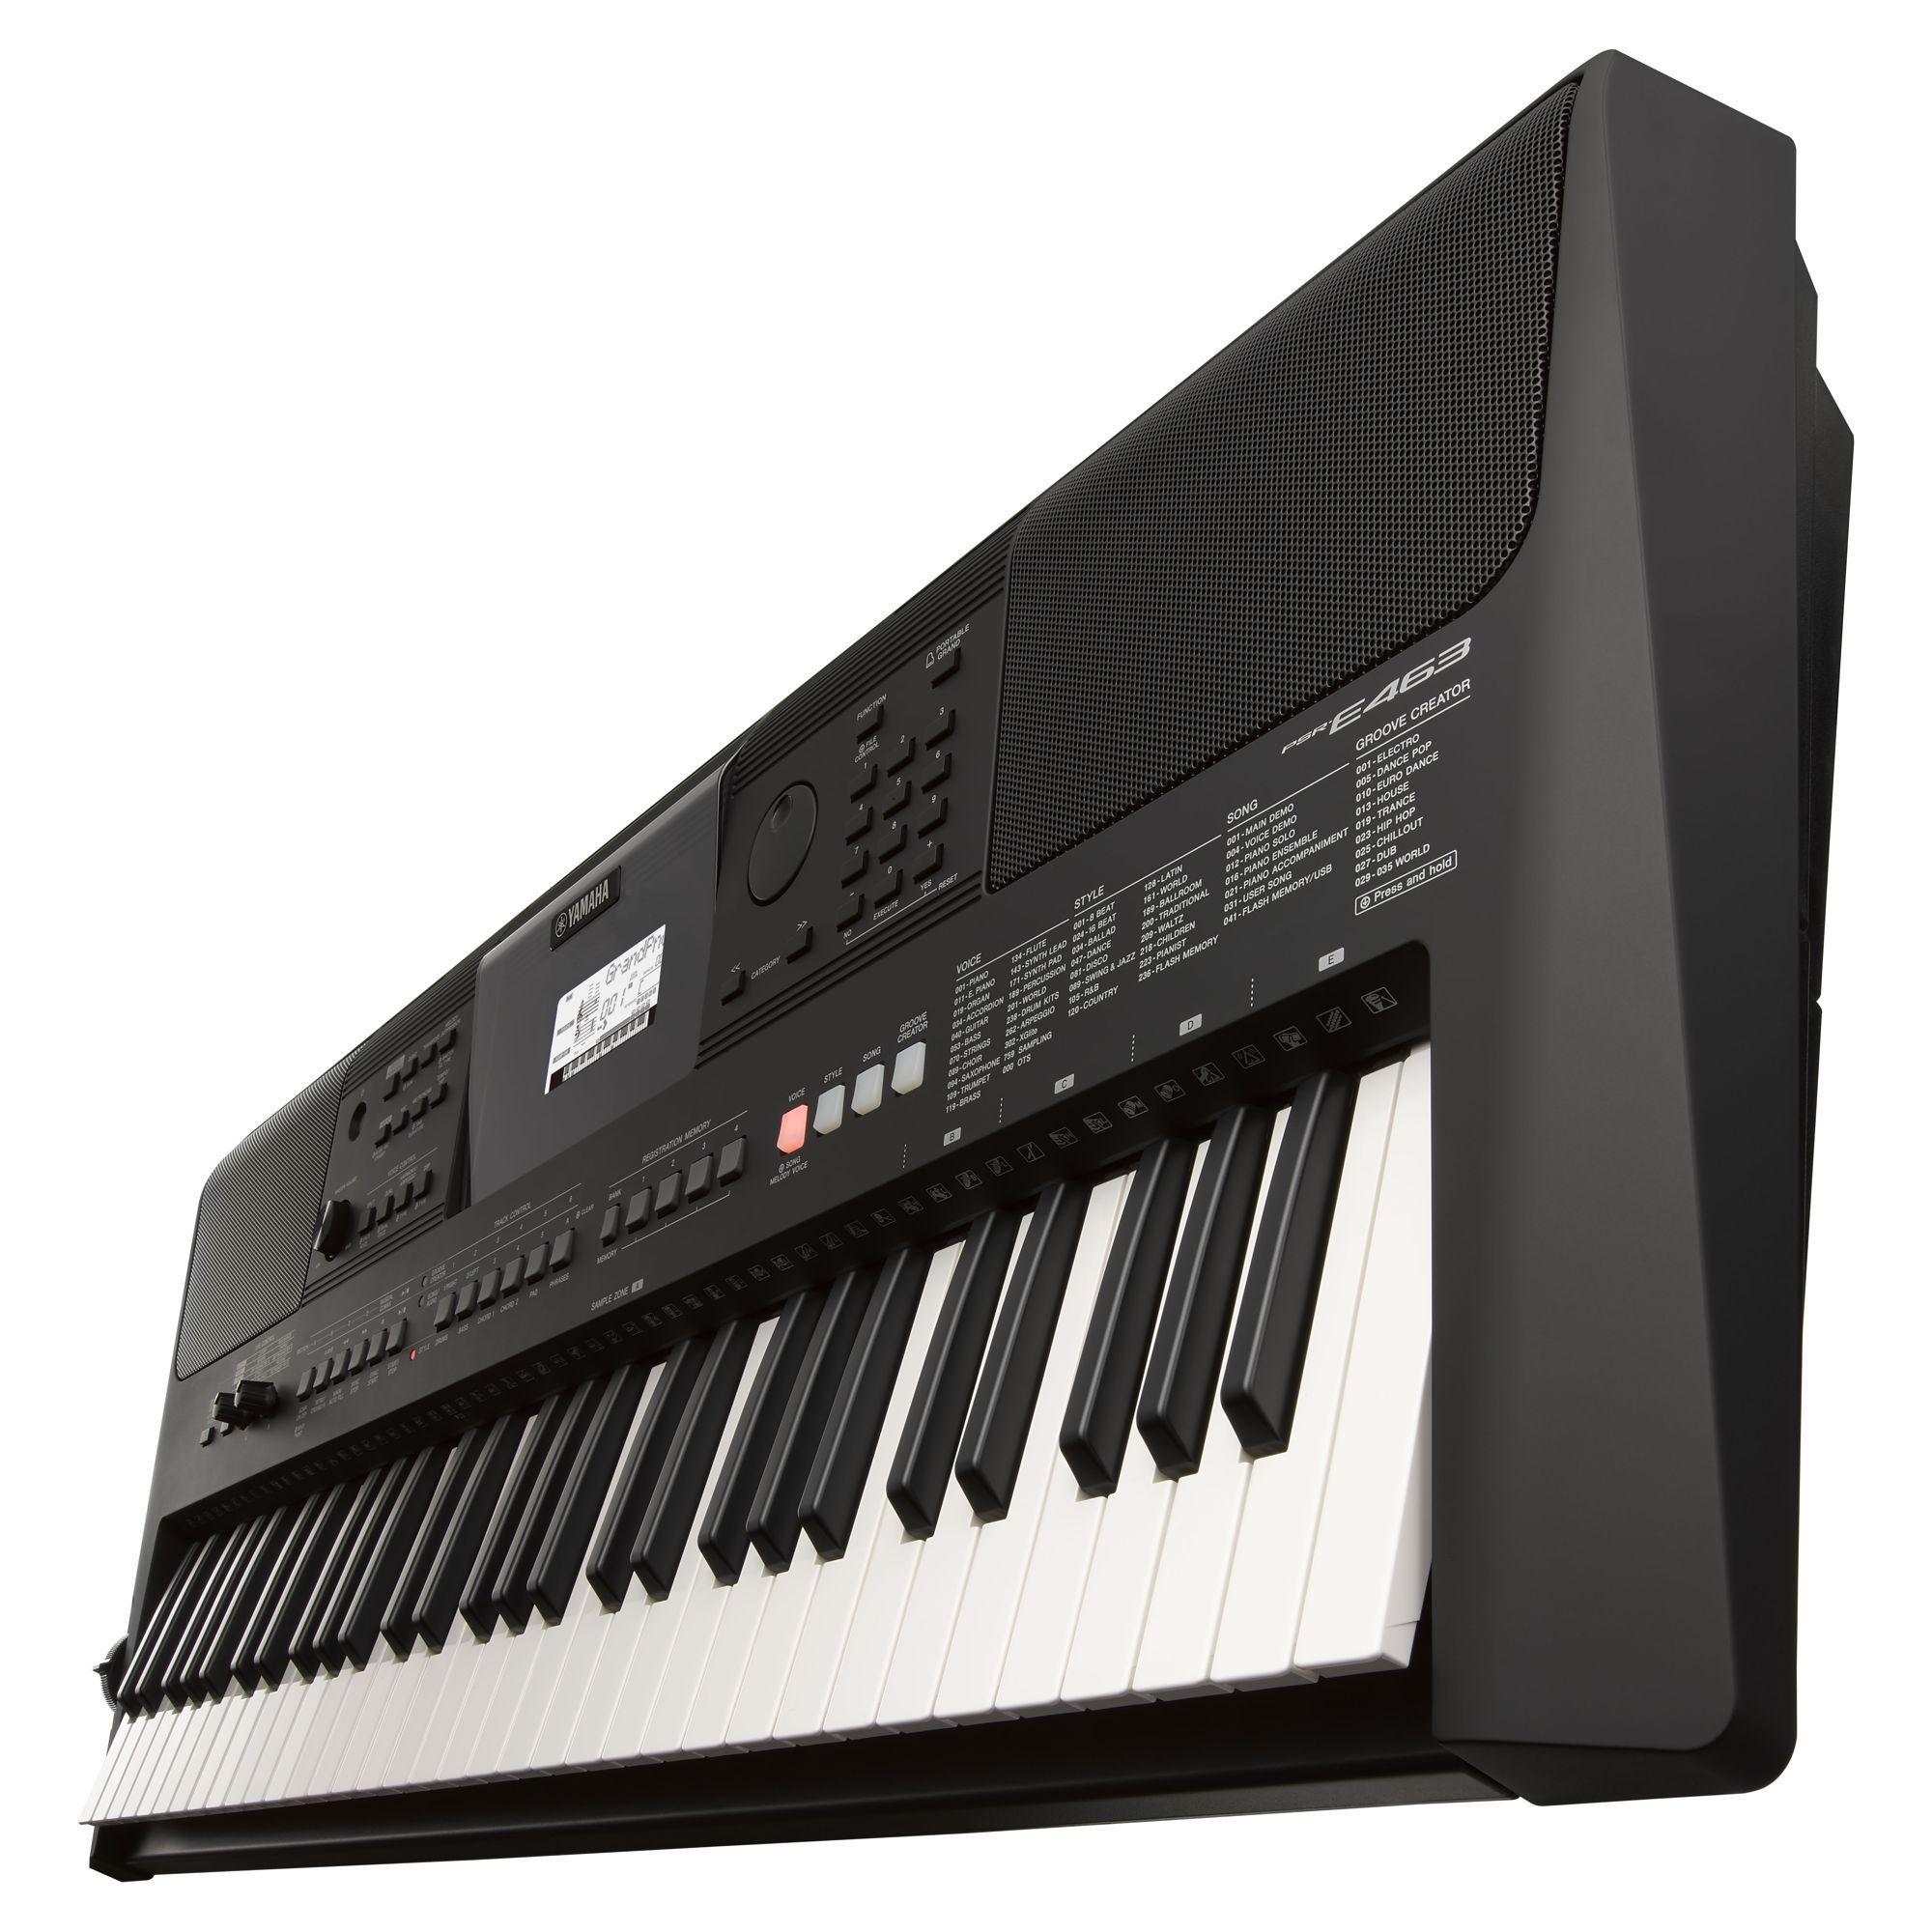 Kit Teclado Musical Yamaha Psr E463 + Capa Suporte